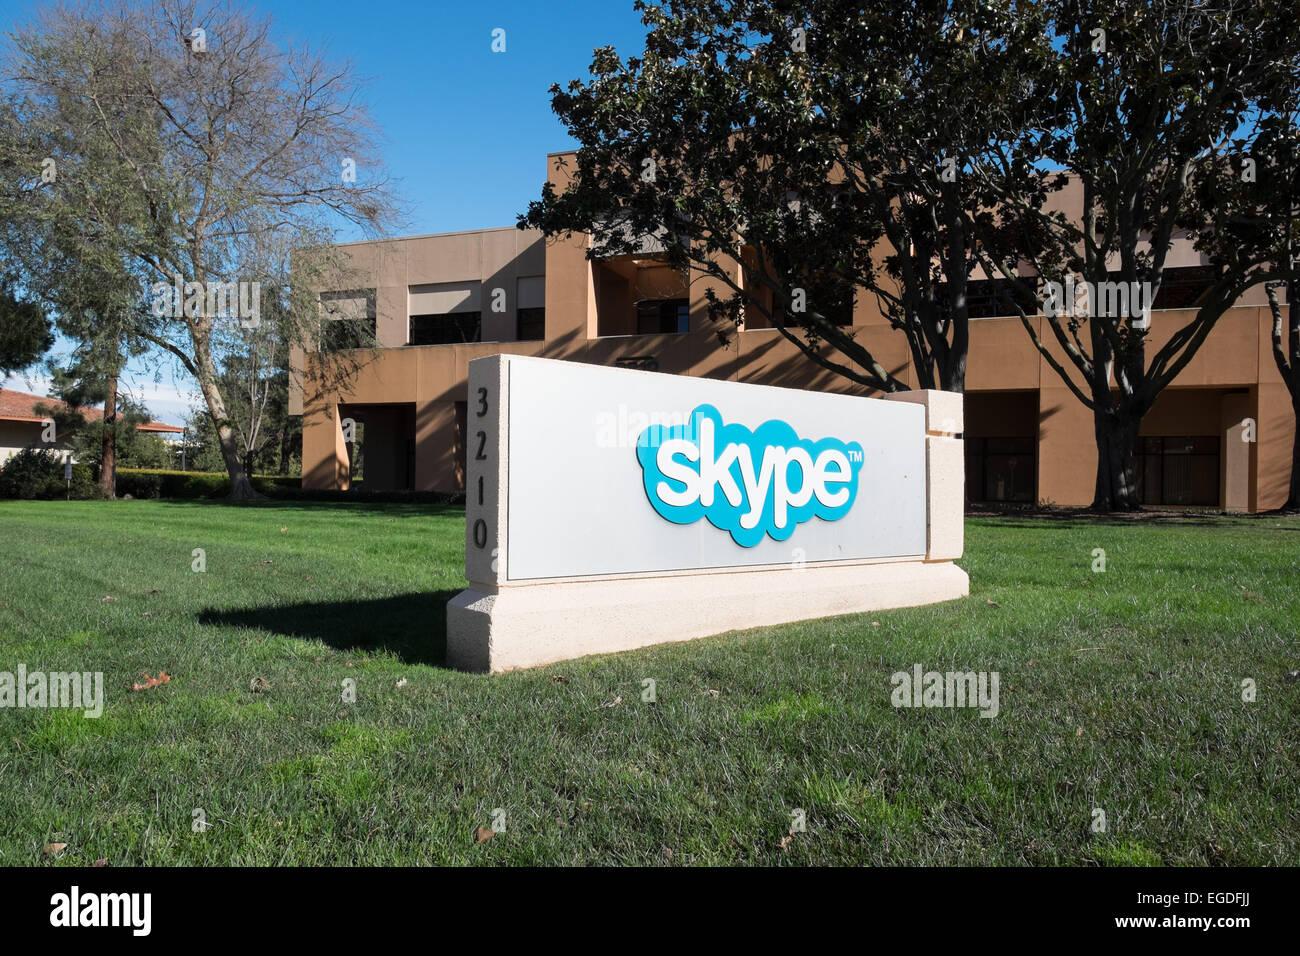 Palo alto stock photos palo alto stock images alamy skype headquarters in silicon valley palo alto ca stock image biocorpaavc